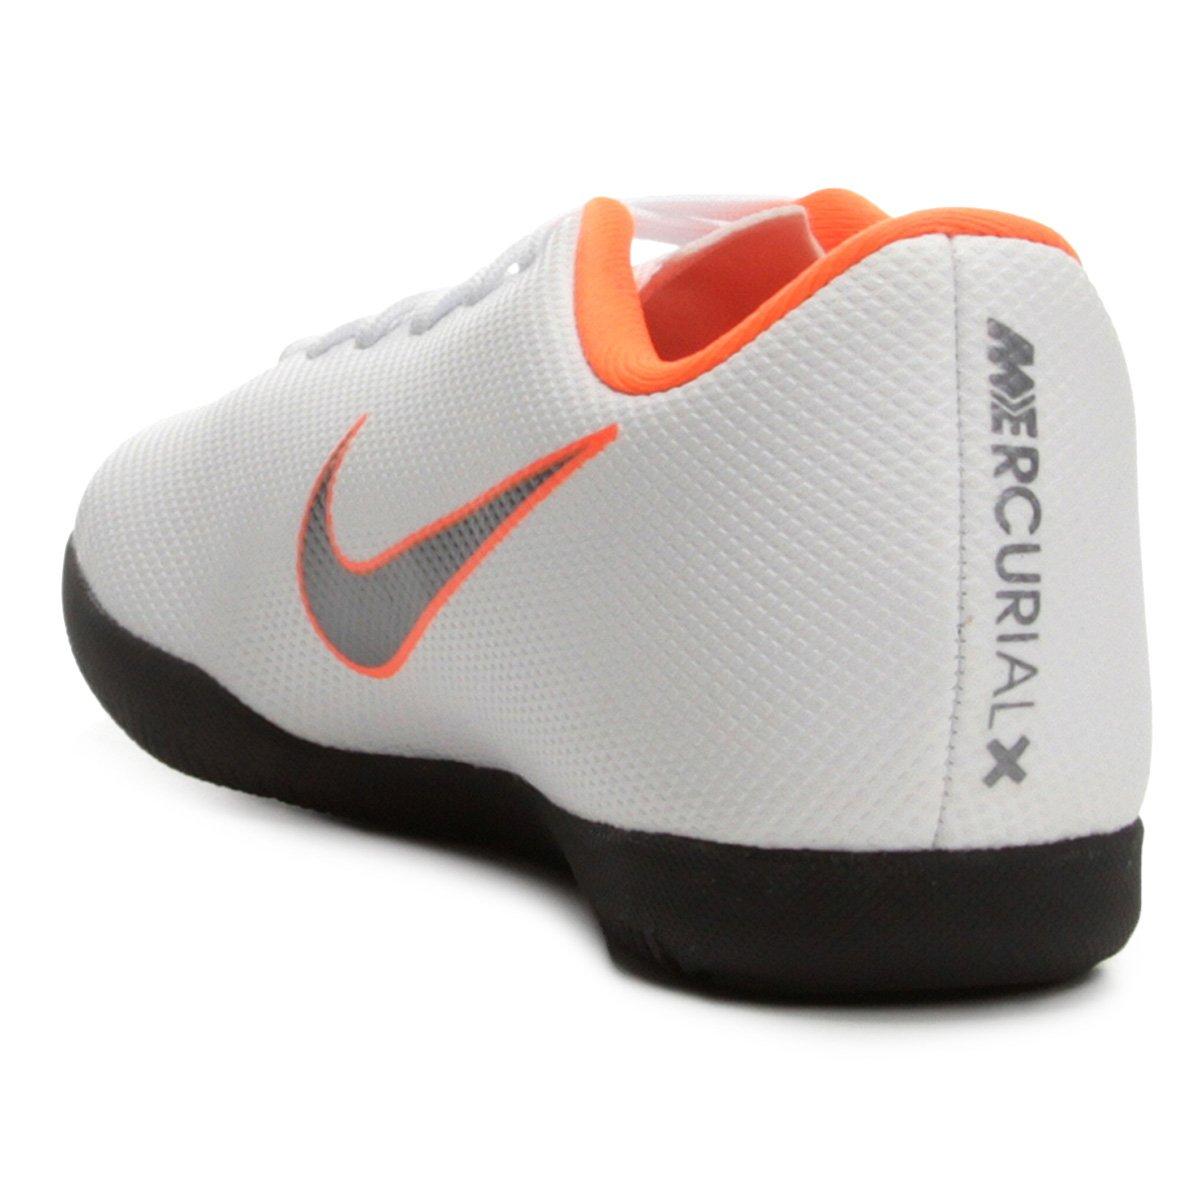 8af00a2412 Chuteira Futsal Infantil Nike Mercurial Vapor 12 Club - Branco e ...